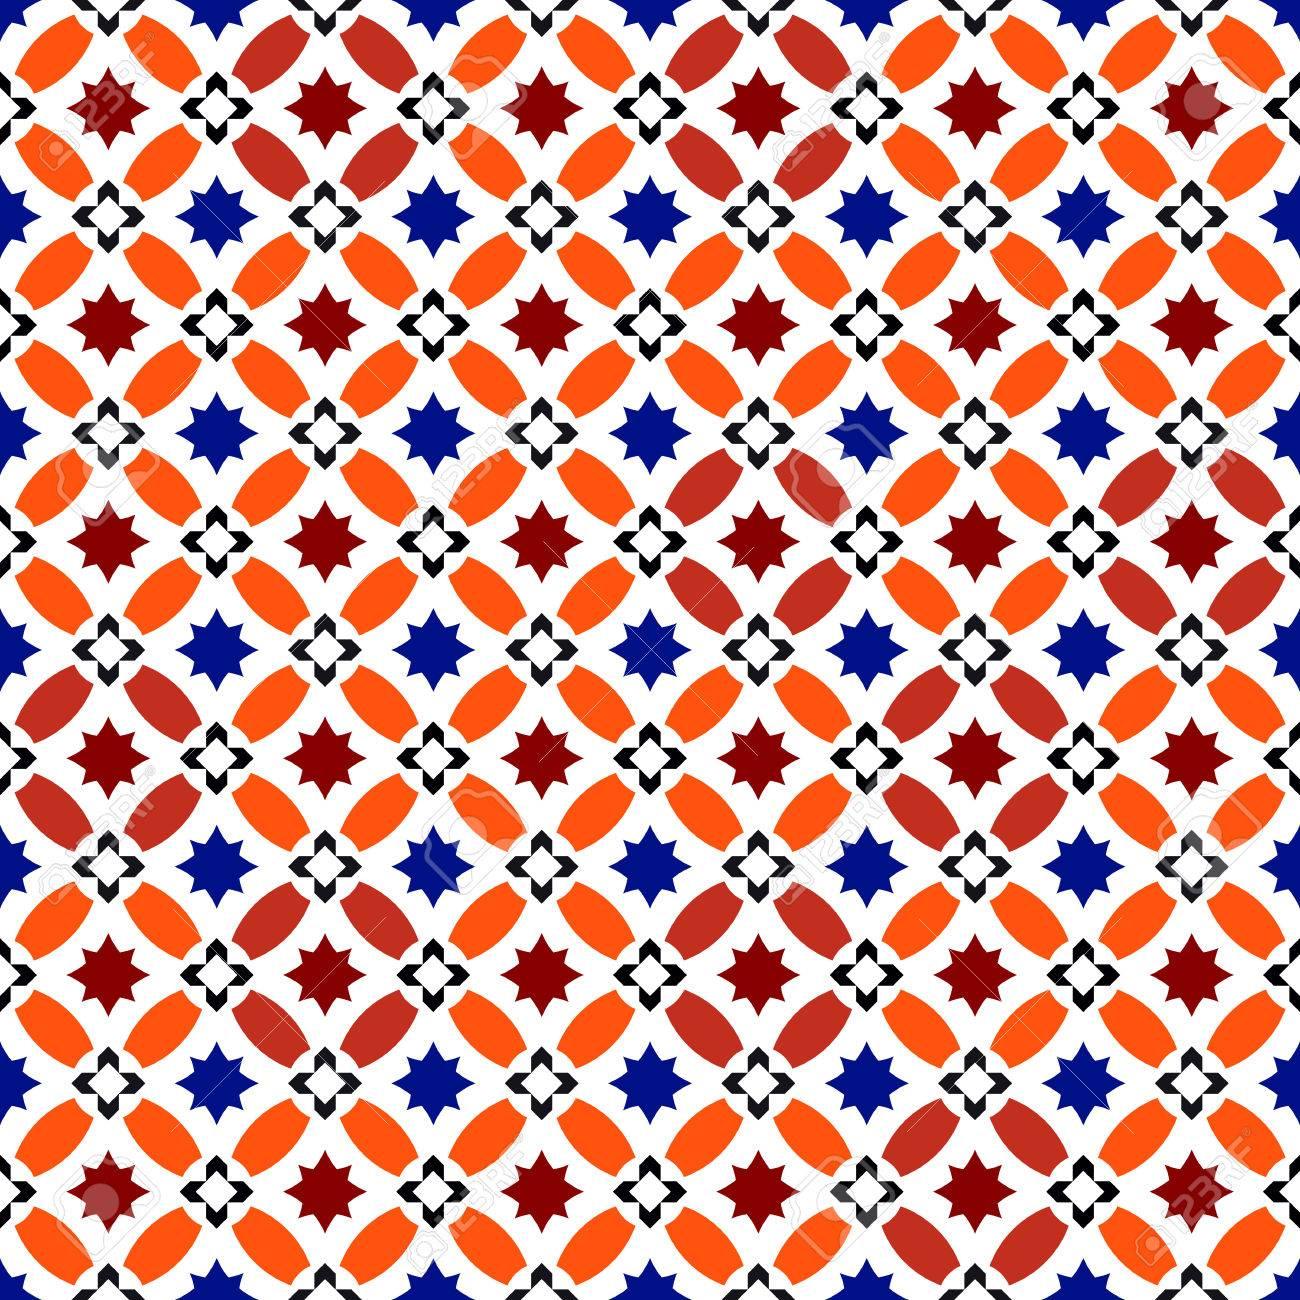 Moroccan Pattern. Mosaic Tiles. Islamic Ornaments. Seamless Vector ...